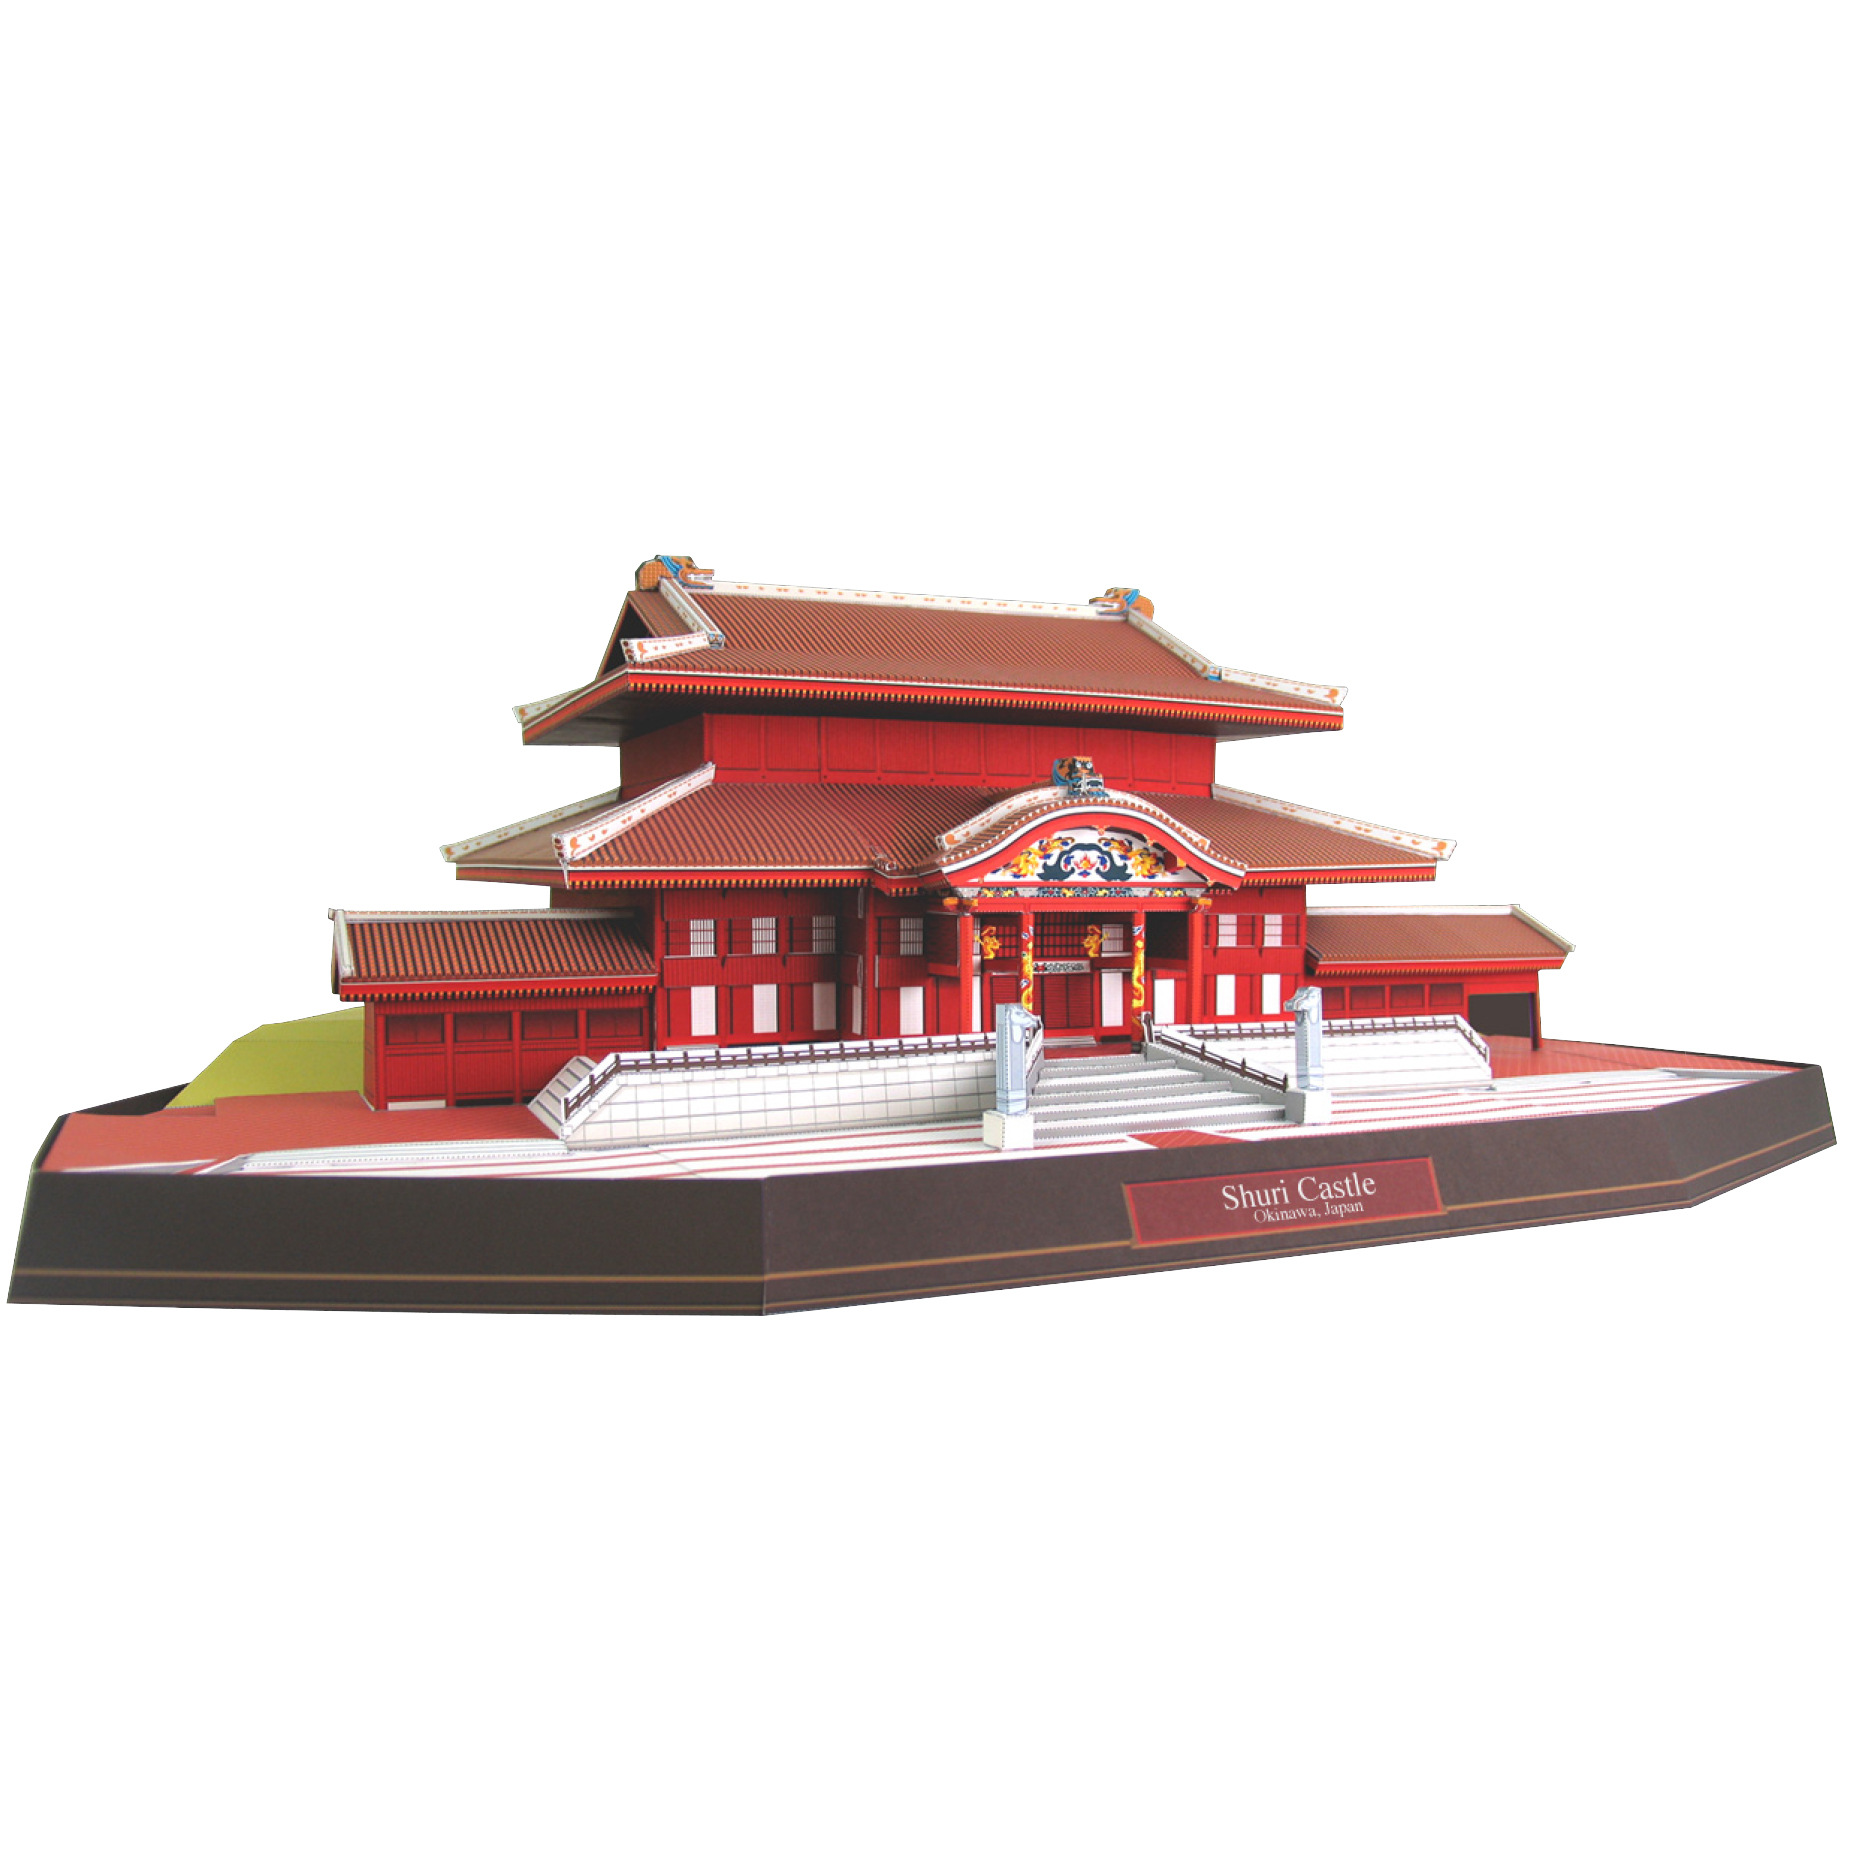 54x30x22cm Japan Shuri Castle 3D Paper Model World Famous Architectural Model Paper Crafts Manual DIY Manual Work Building Model